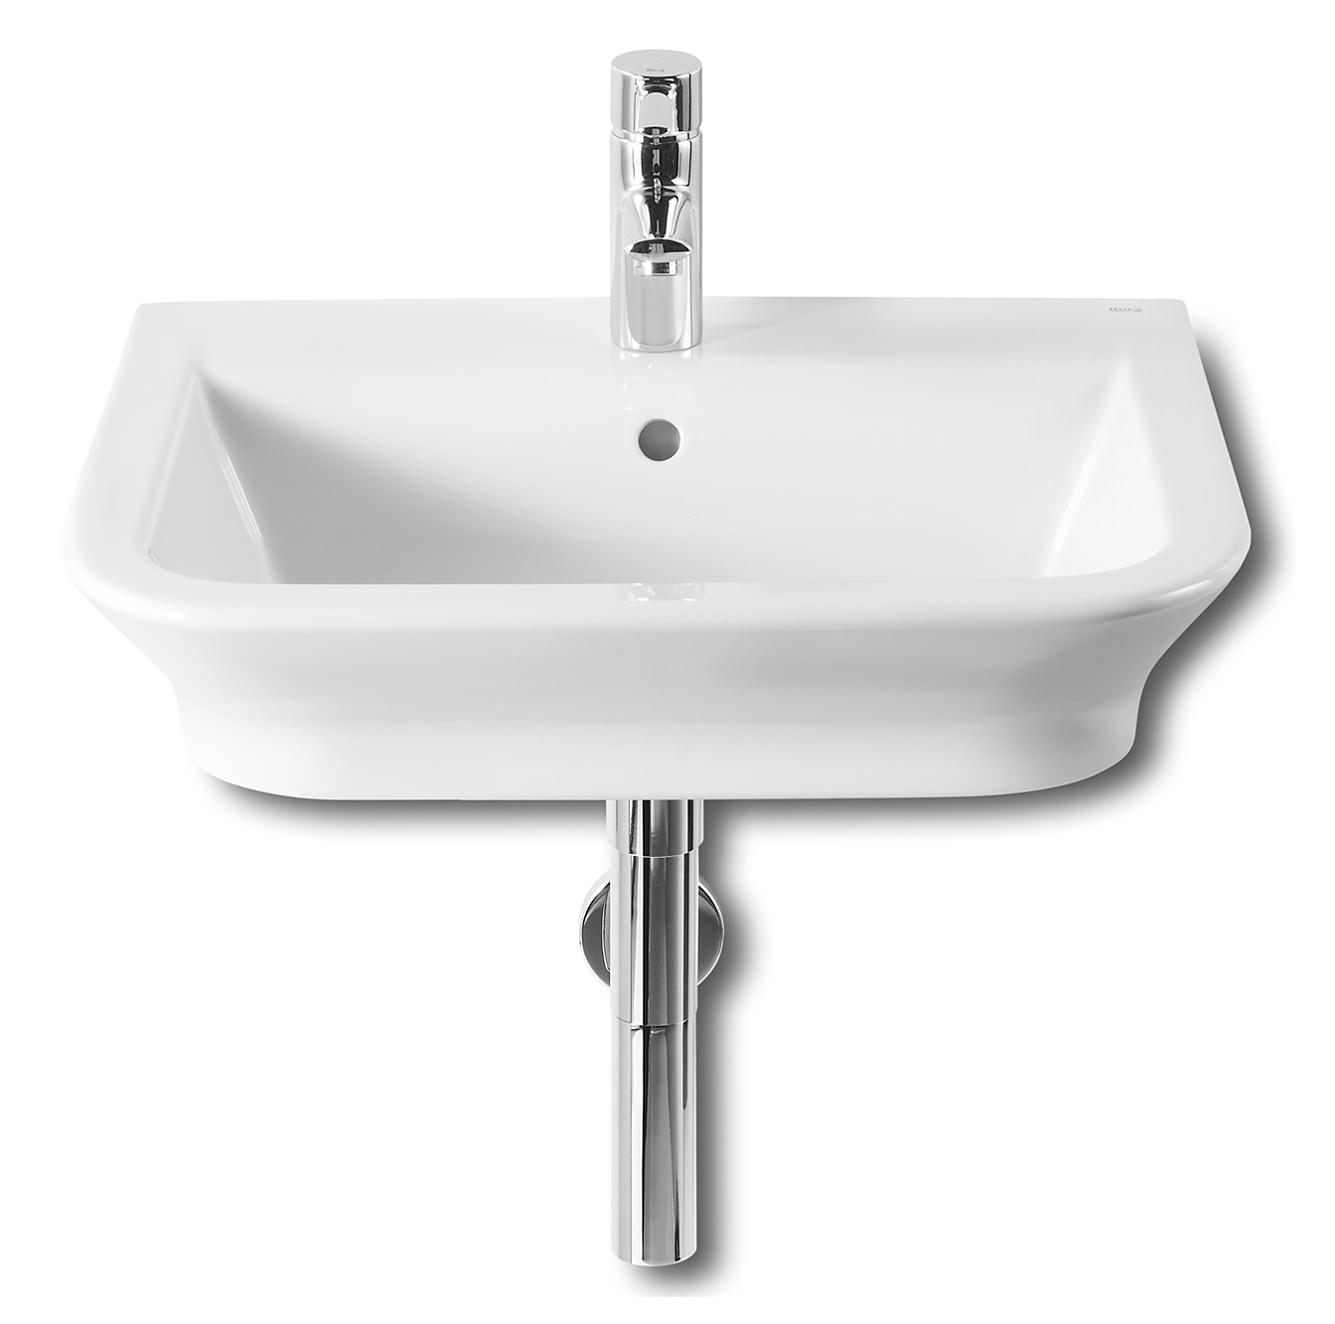 roca the gap wall hung or countertop basin 550mm wide 327475000. Black Bedroom Furniture Sets. Home Design Ideas